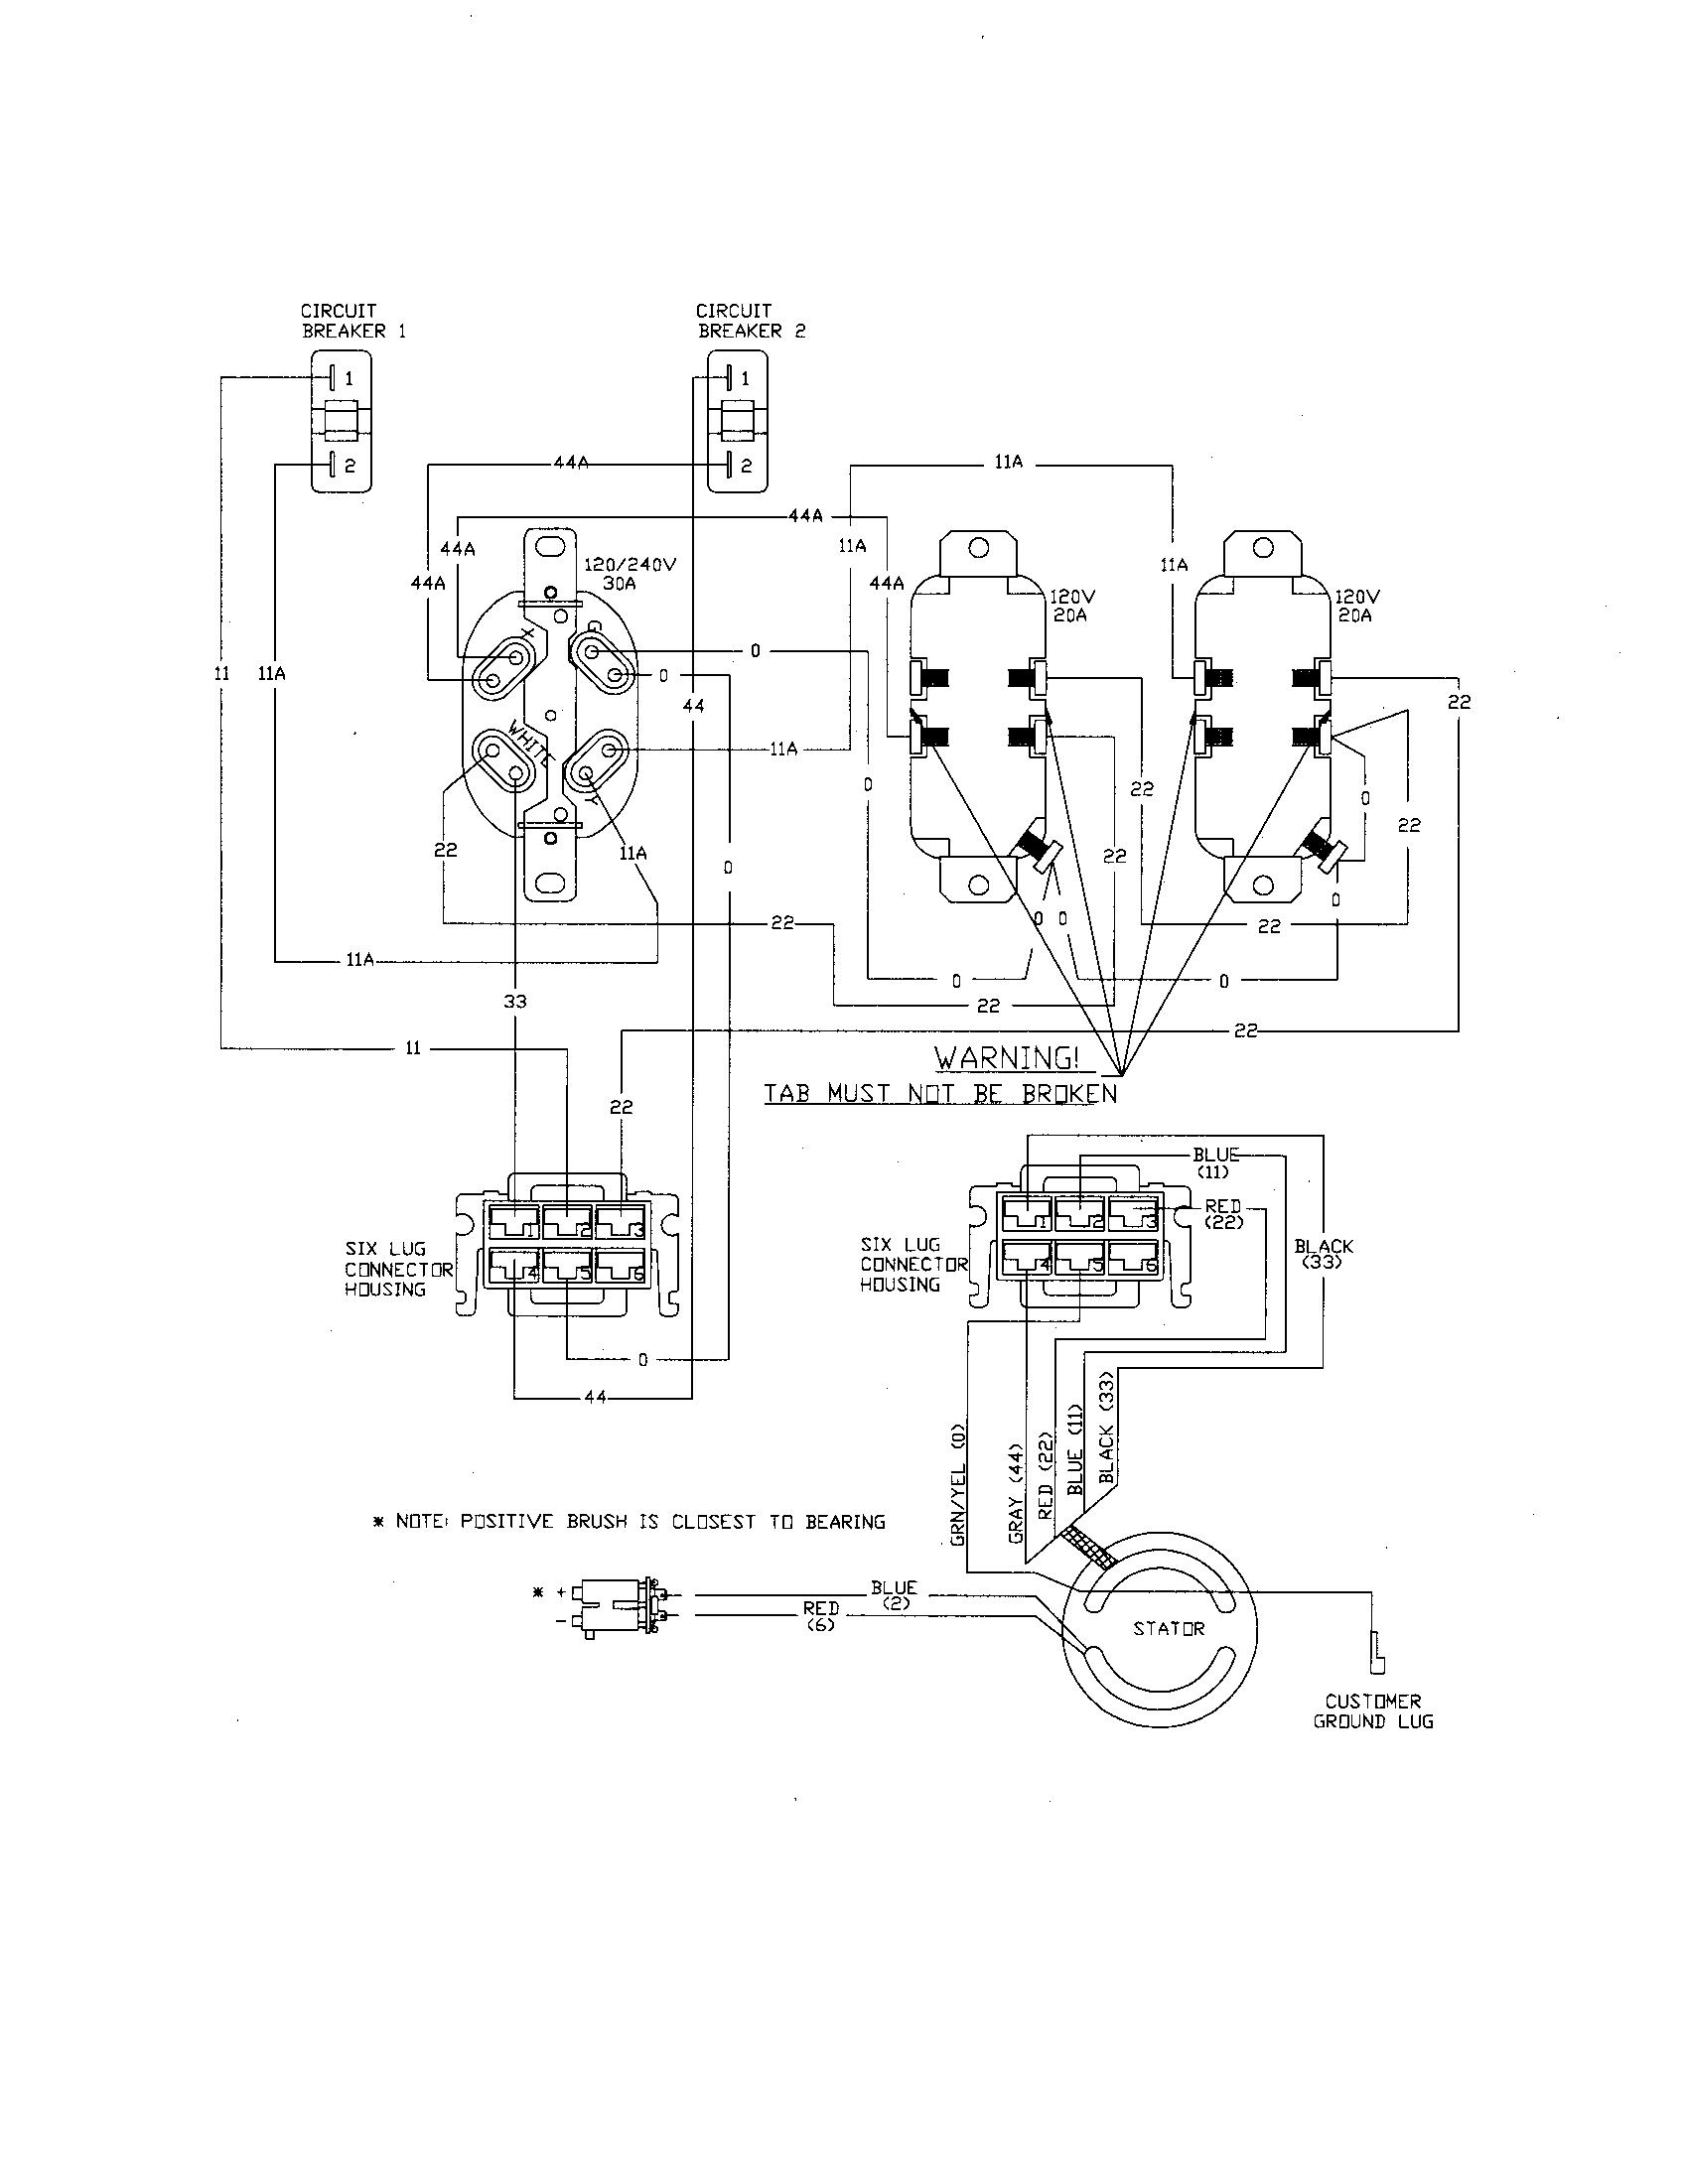 Craftsman model 580325601 generator genuine parts